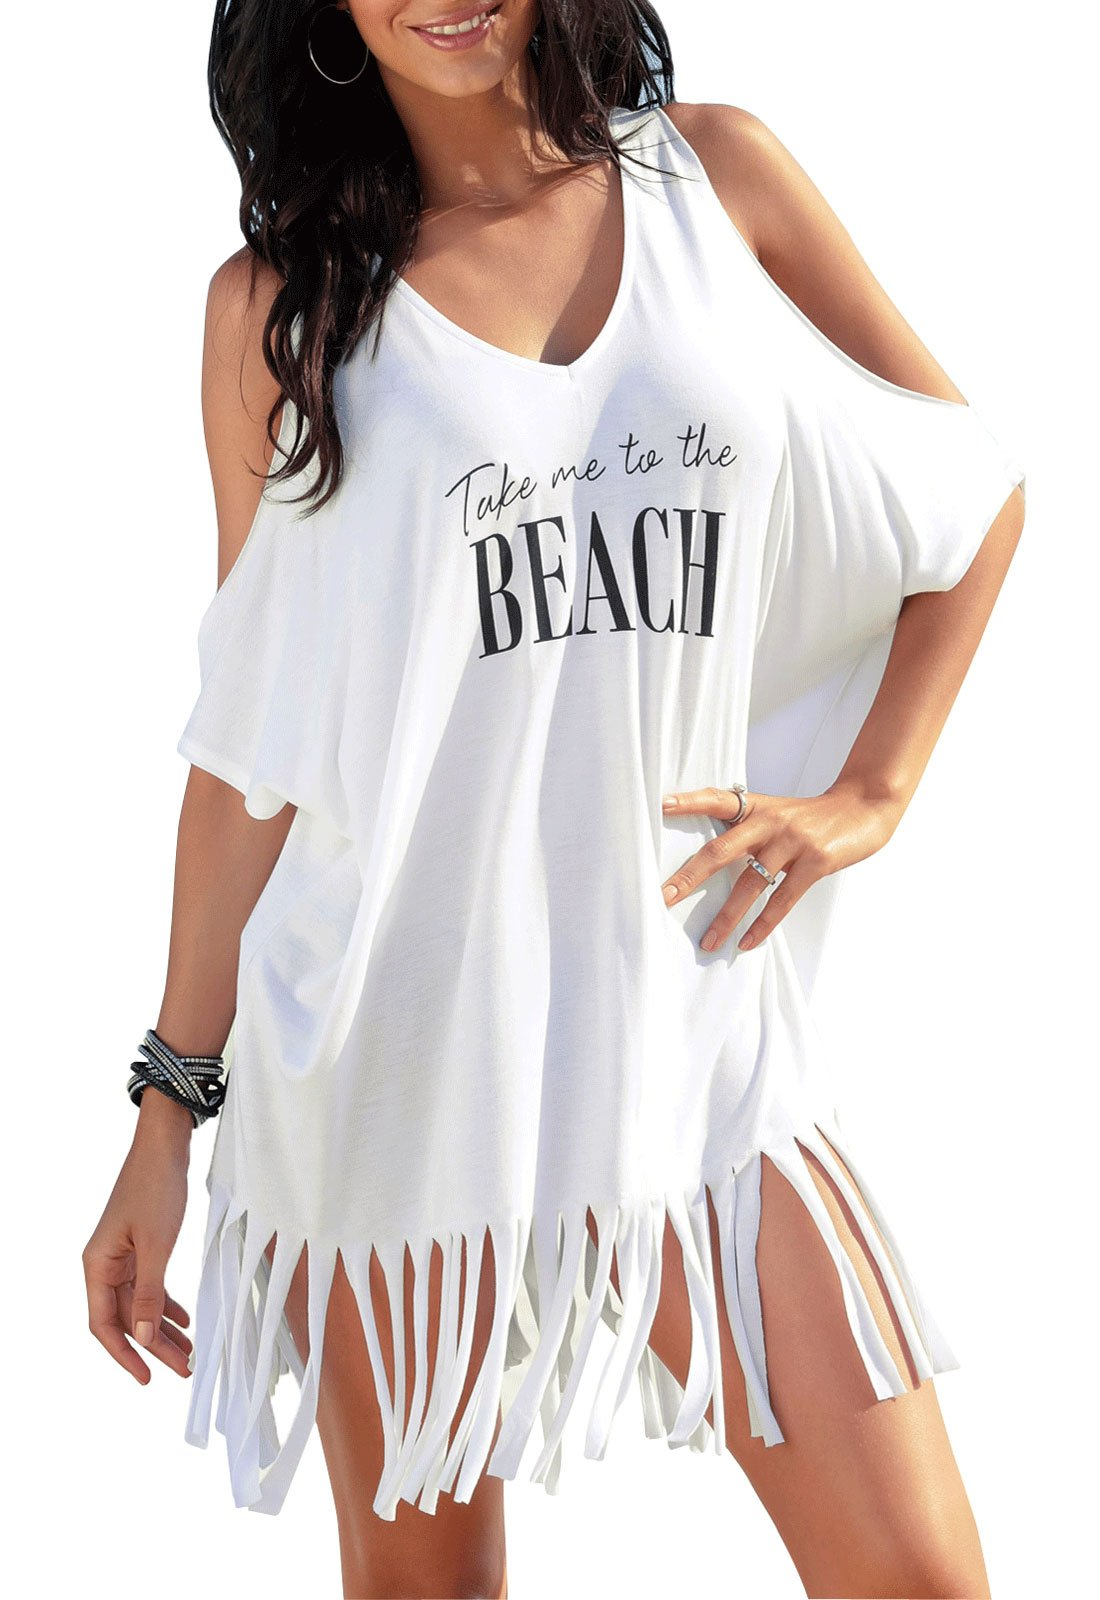 Yinggeli Womens Letters Print Baggy Swimwear Bikini Cover up Beach Dress T-Shirt(White)